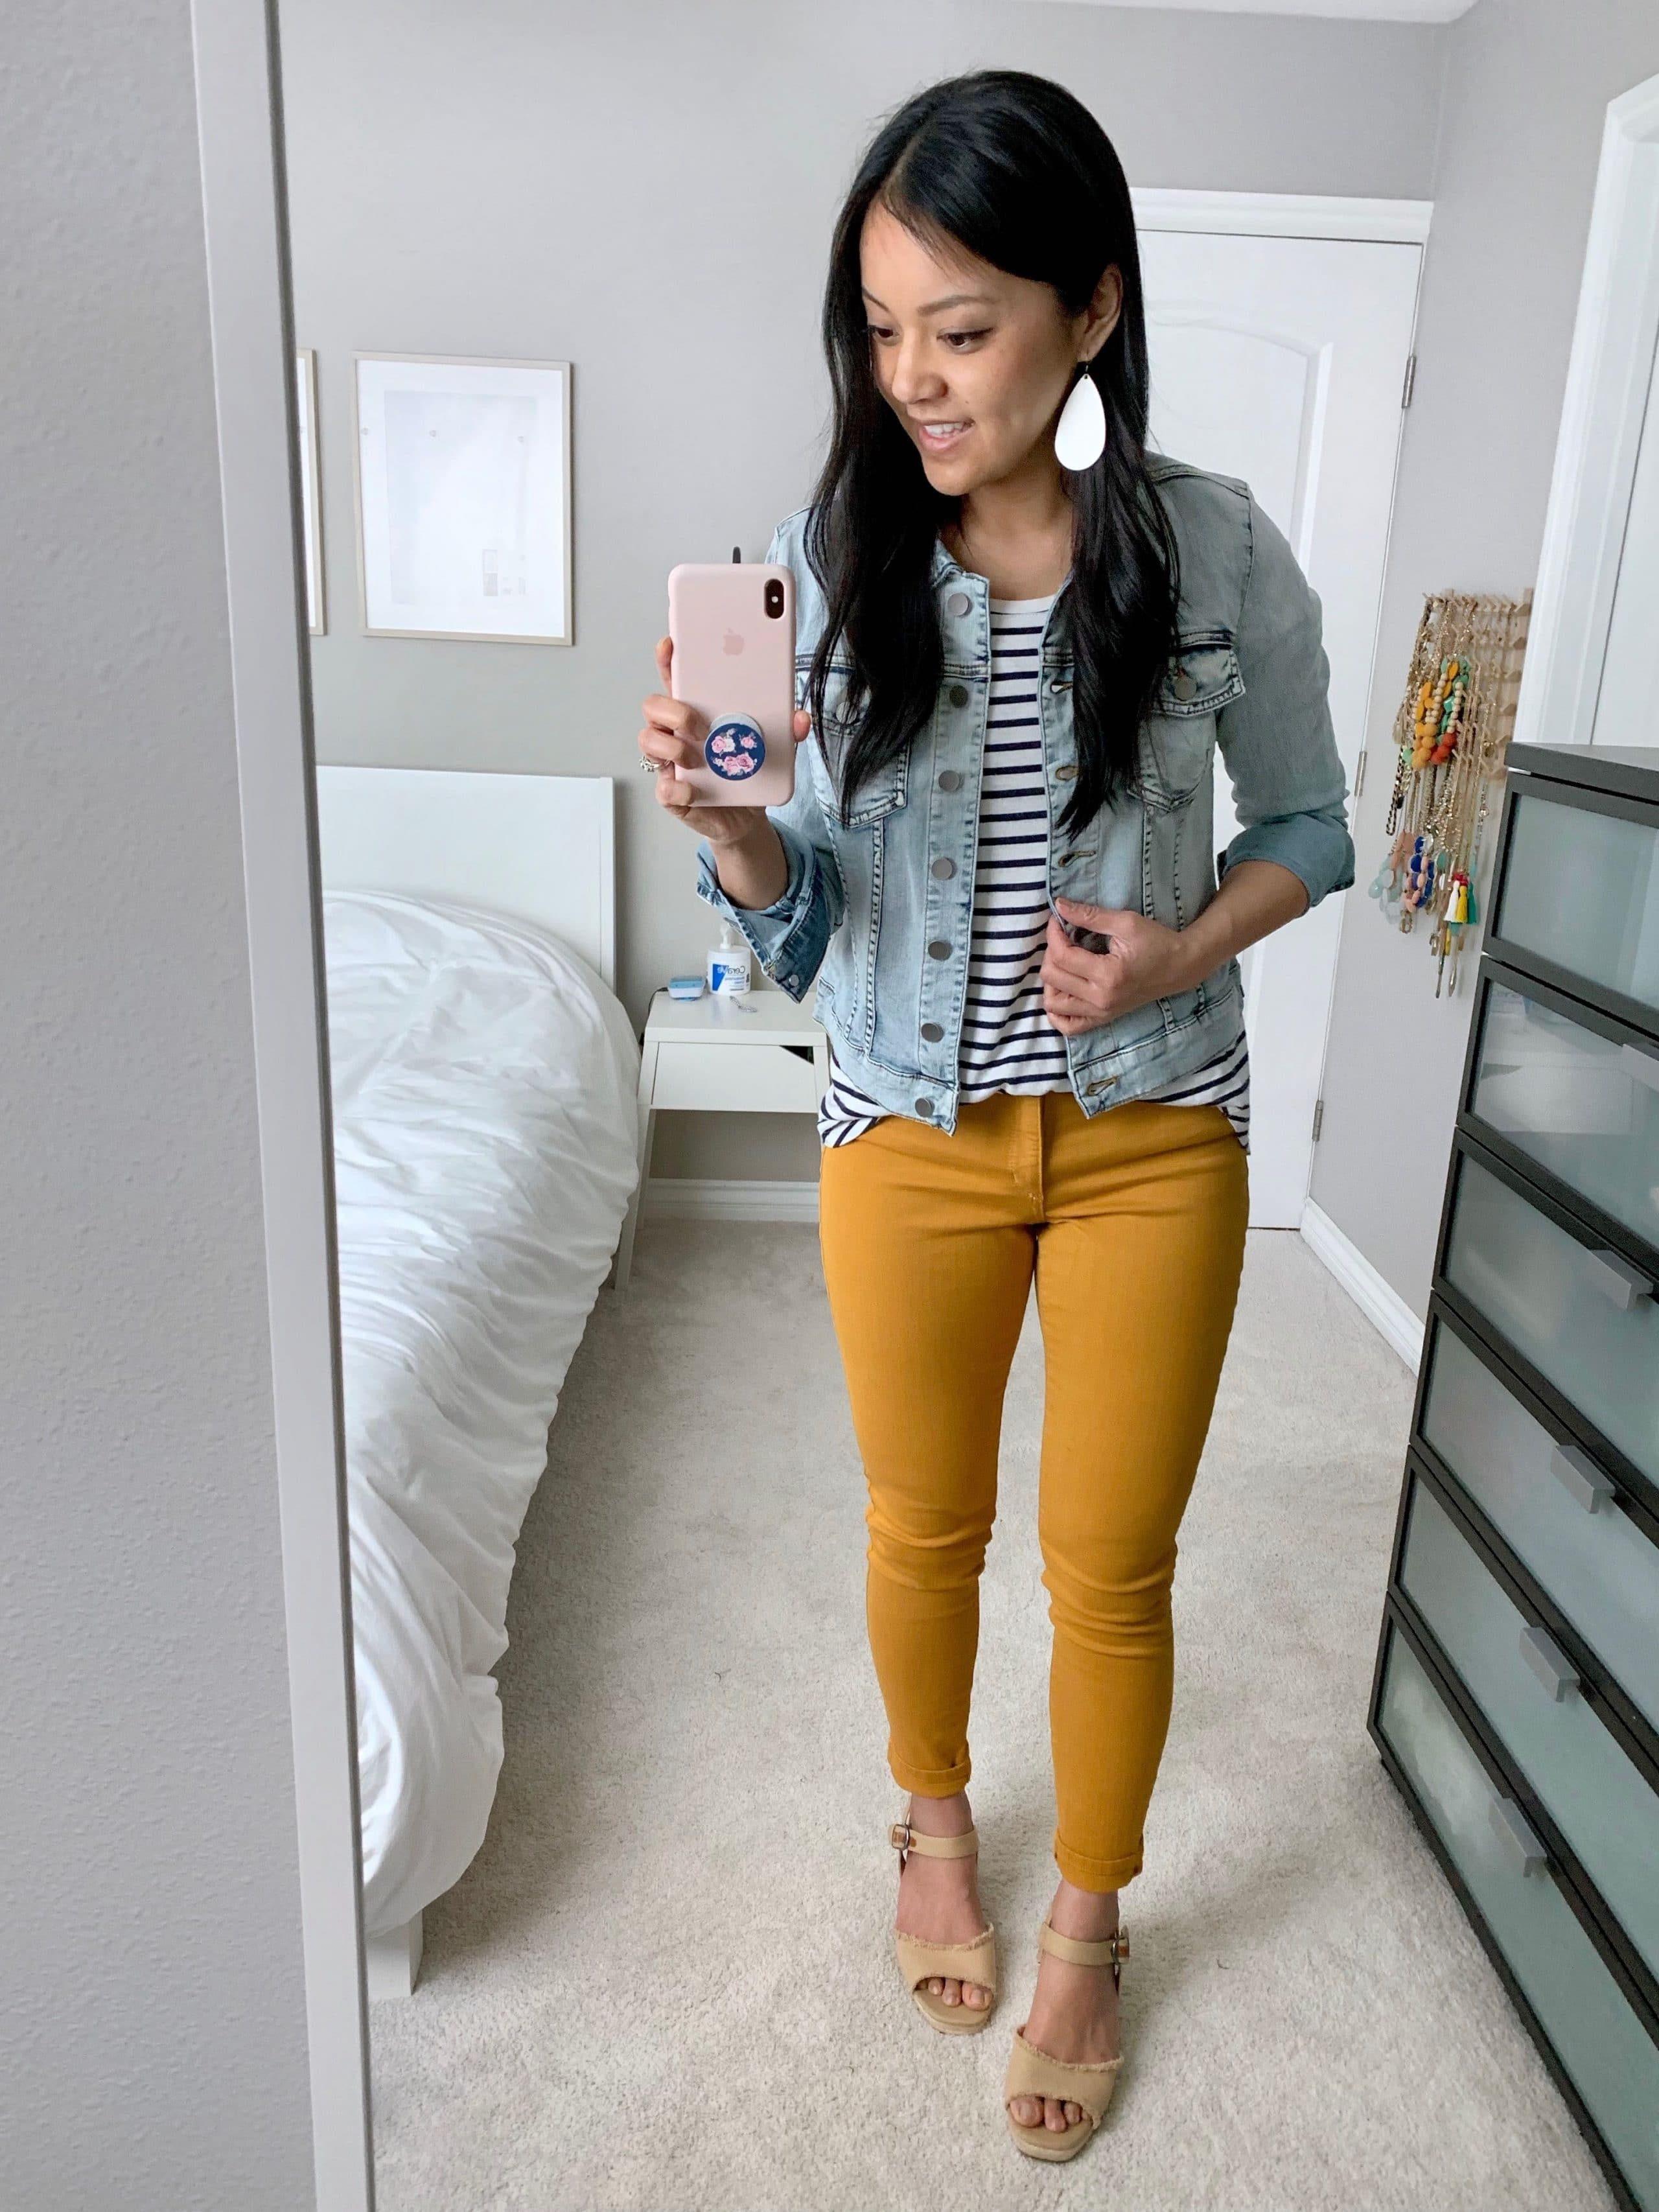 mustard yellow jeans + striped tee + denim jacket